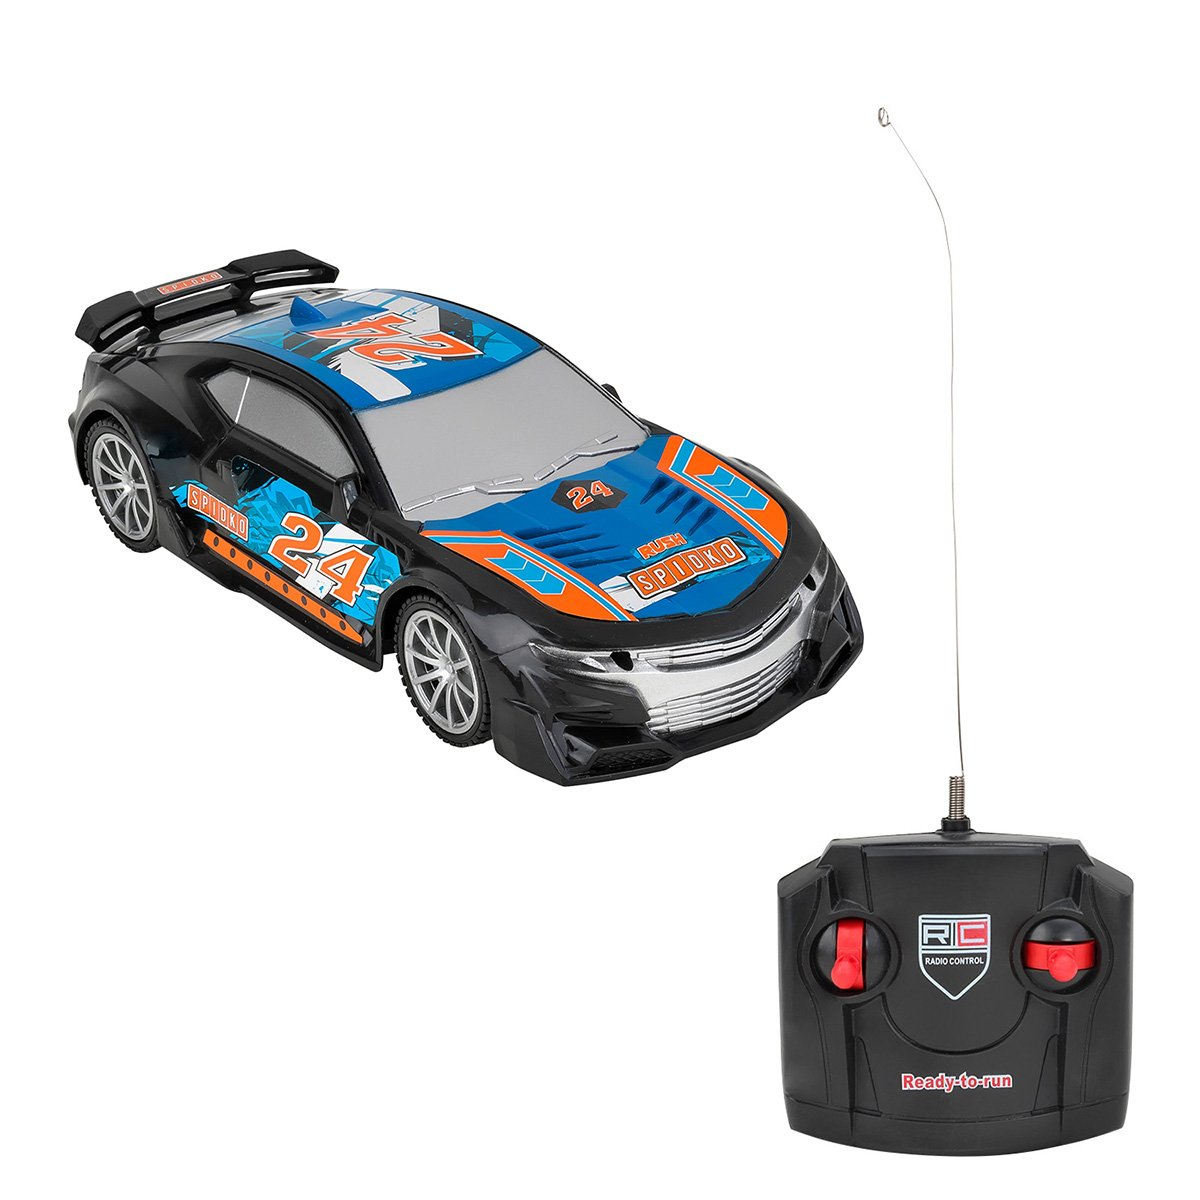 Masinuta cu telecomanda Globo Racing Car, Albastru